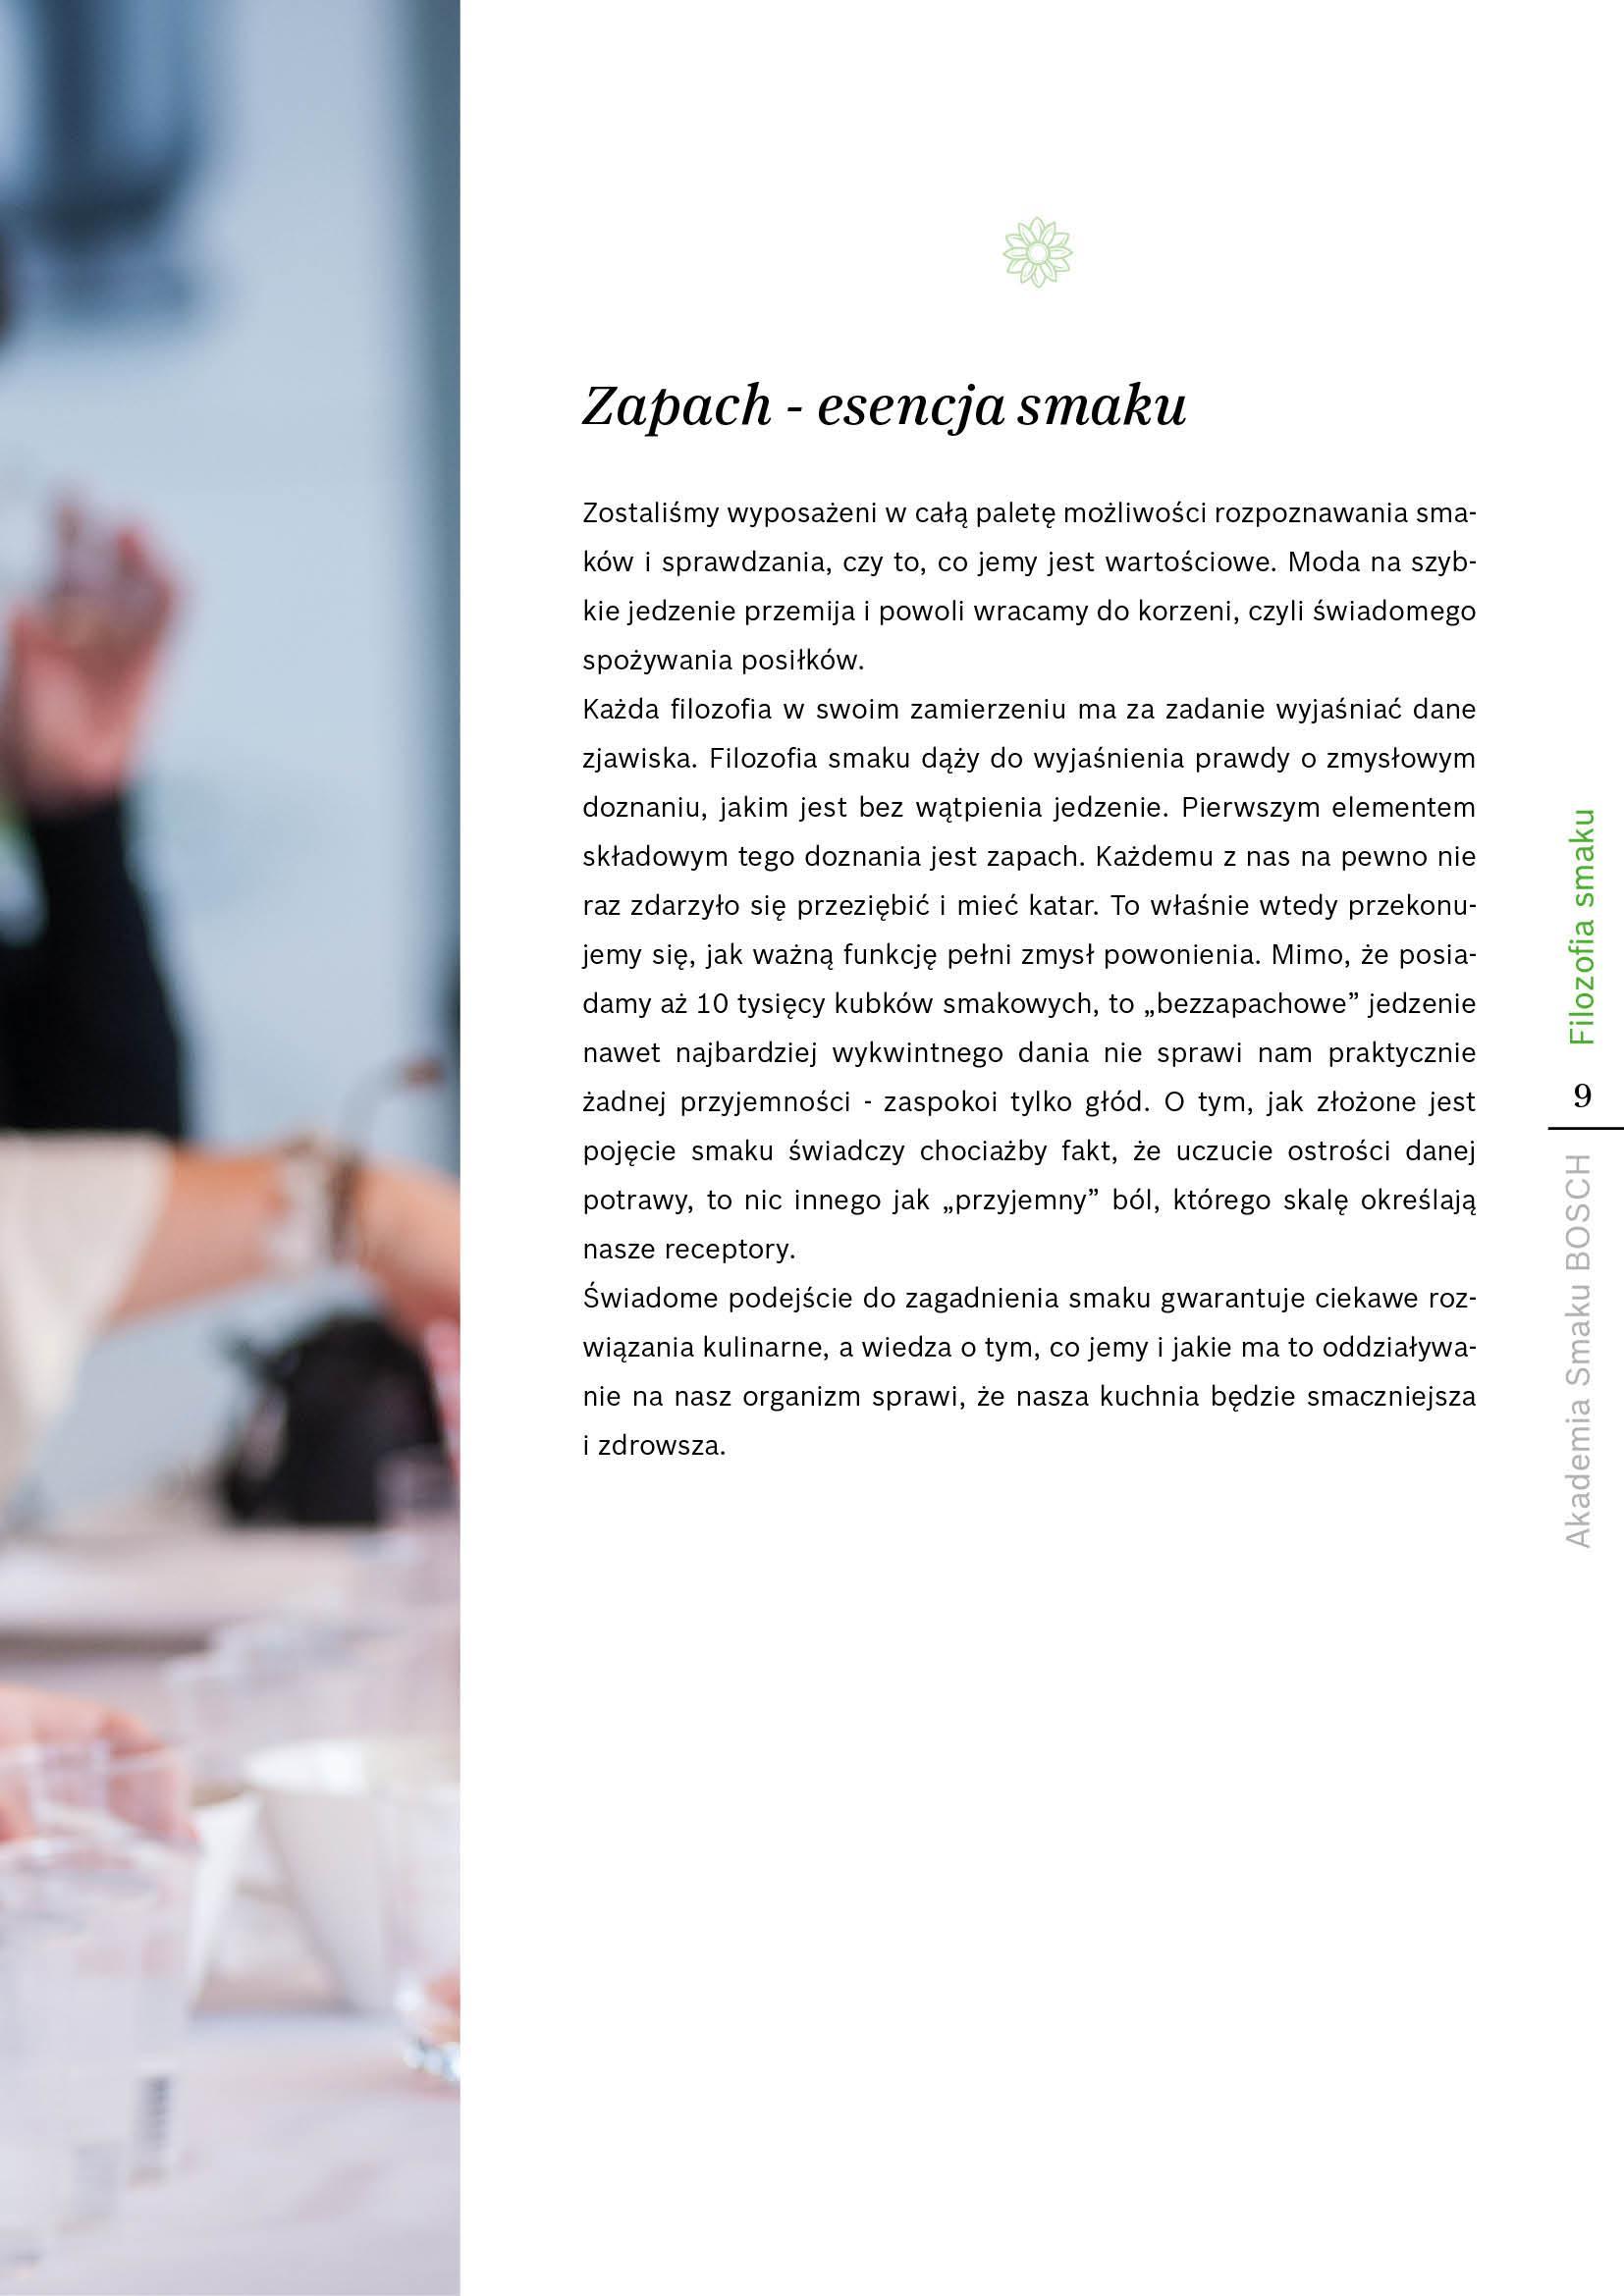 Filozofia smaku - Strona 9